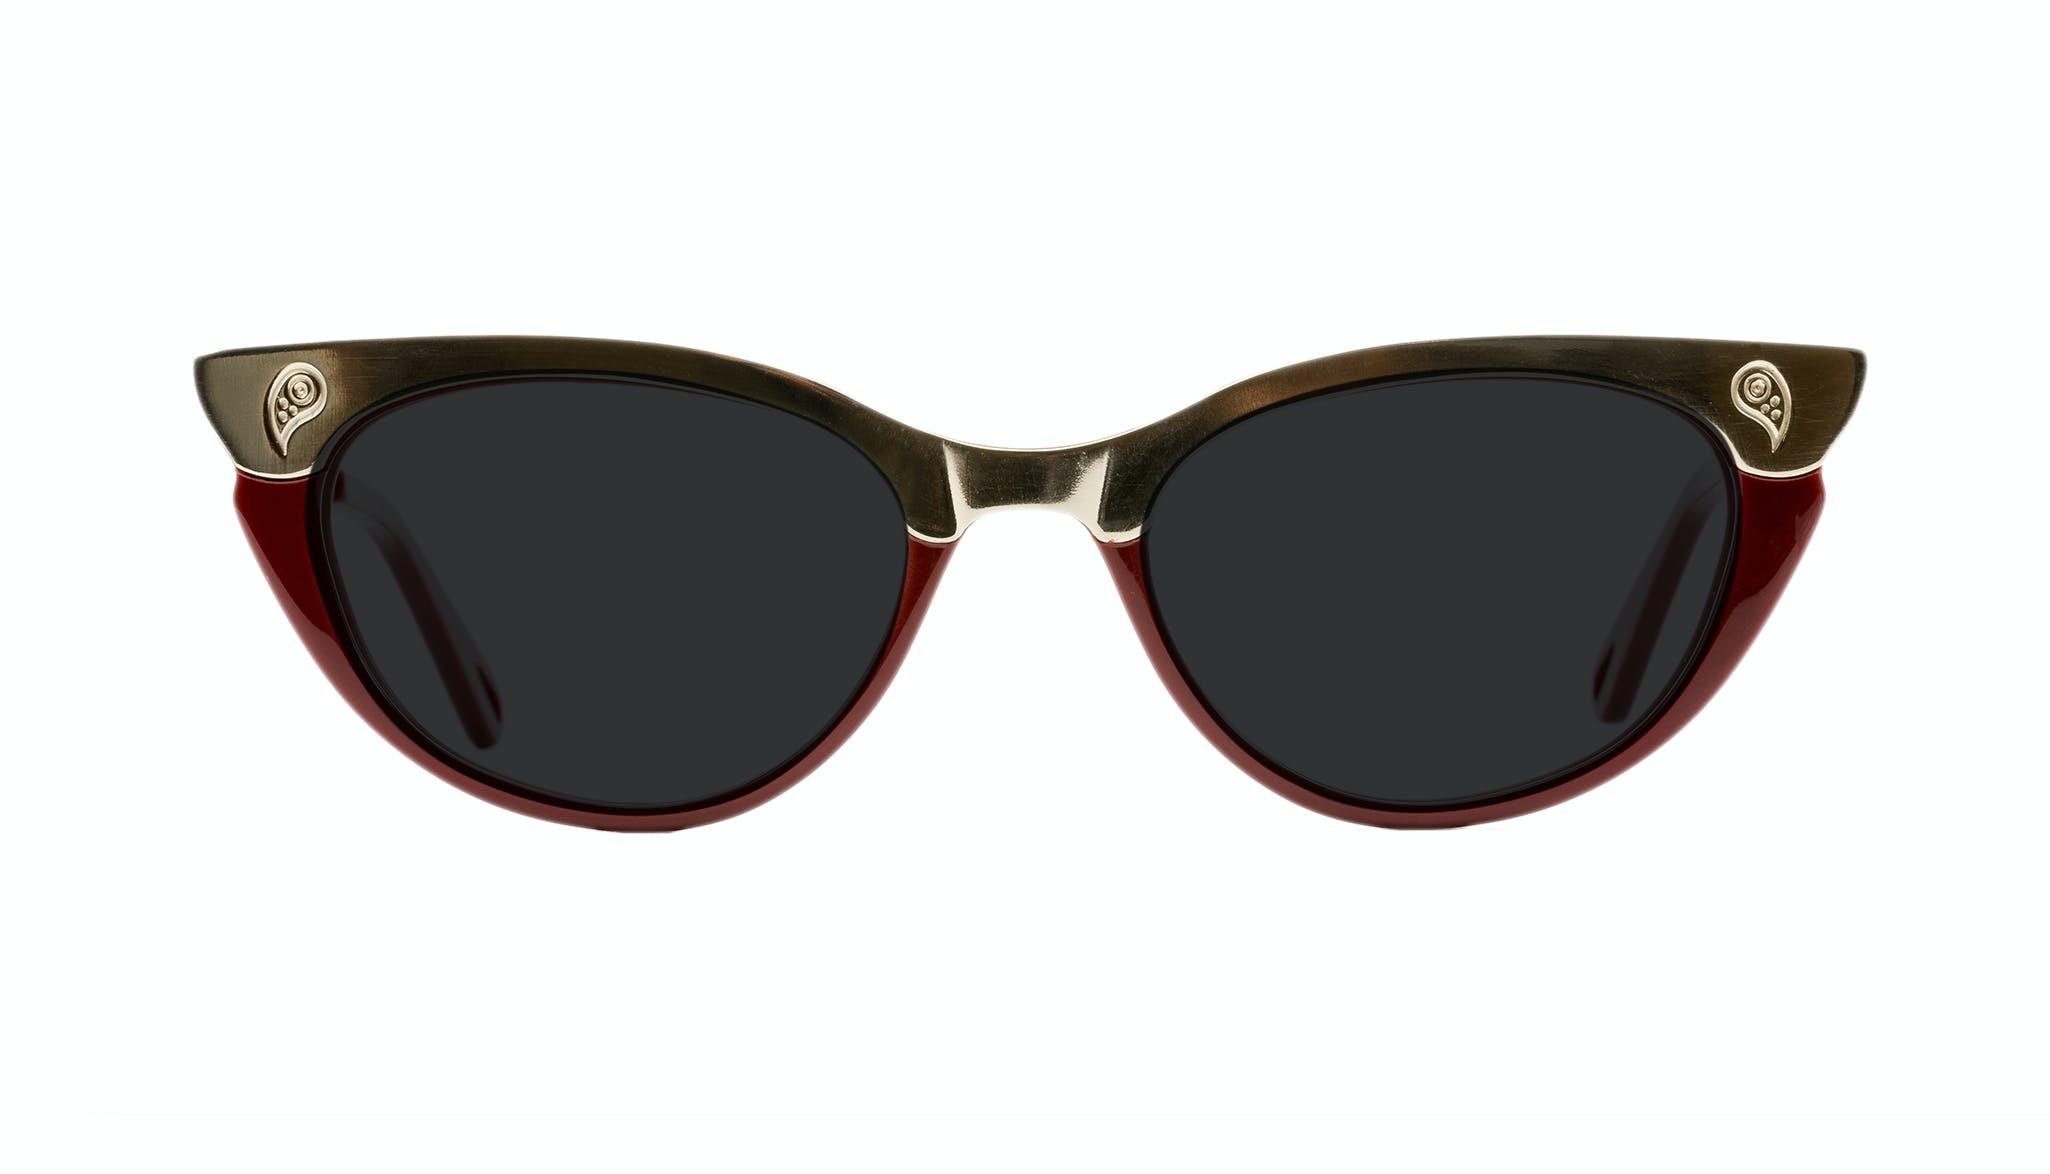 Affordable Fashion Glasses Cat Eye Daring Cateye Sunglasses Women Bad Beti Paro